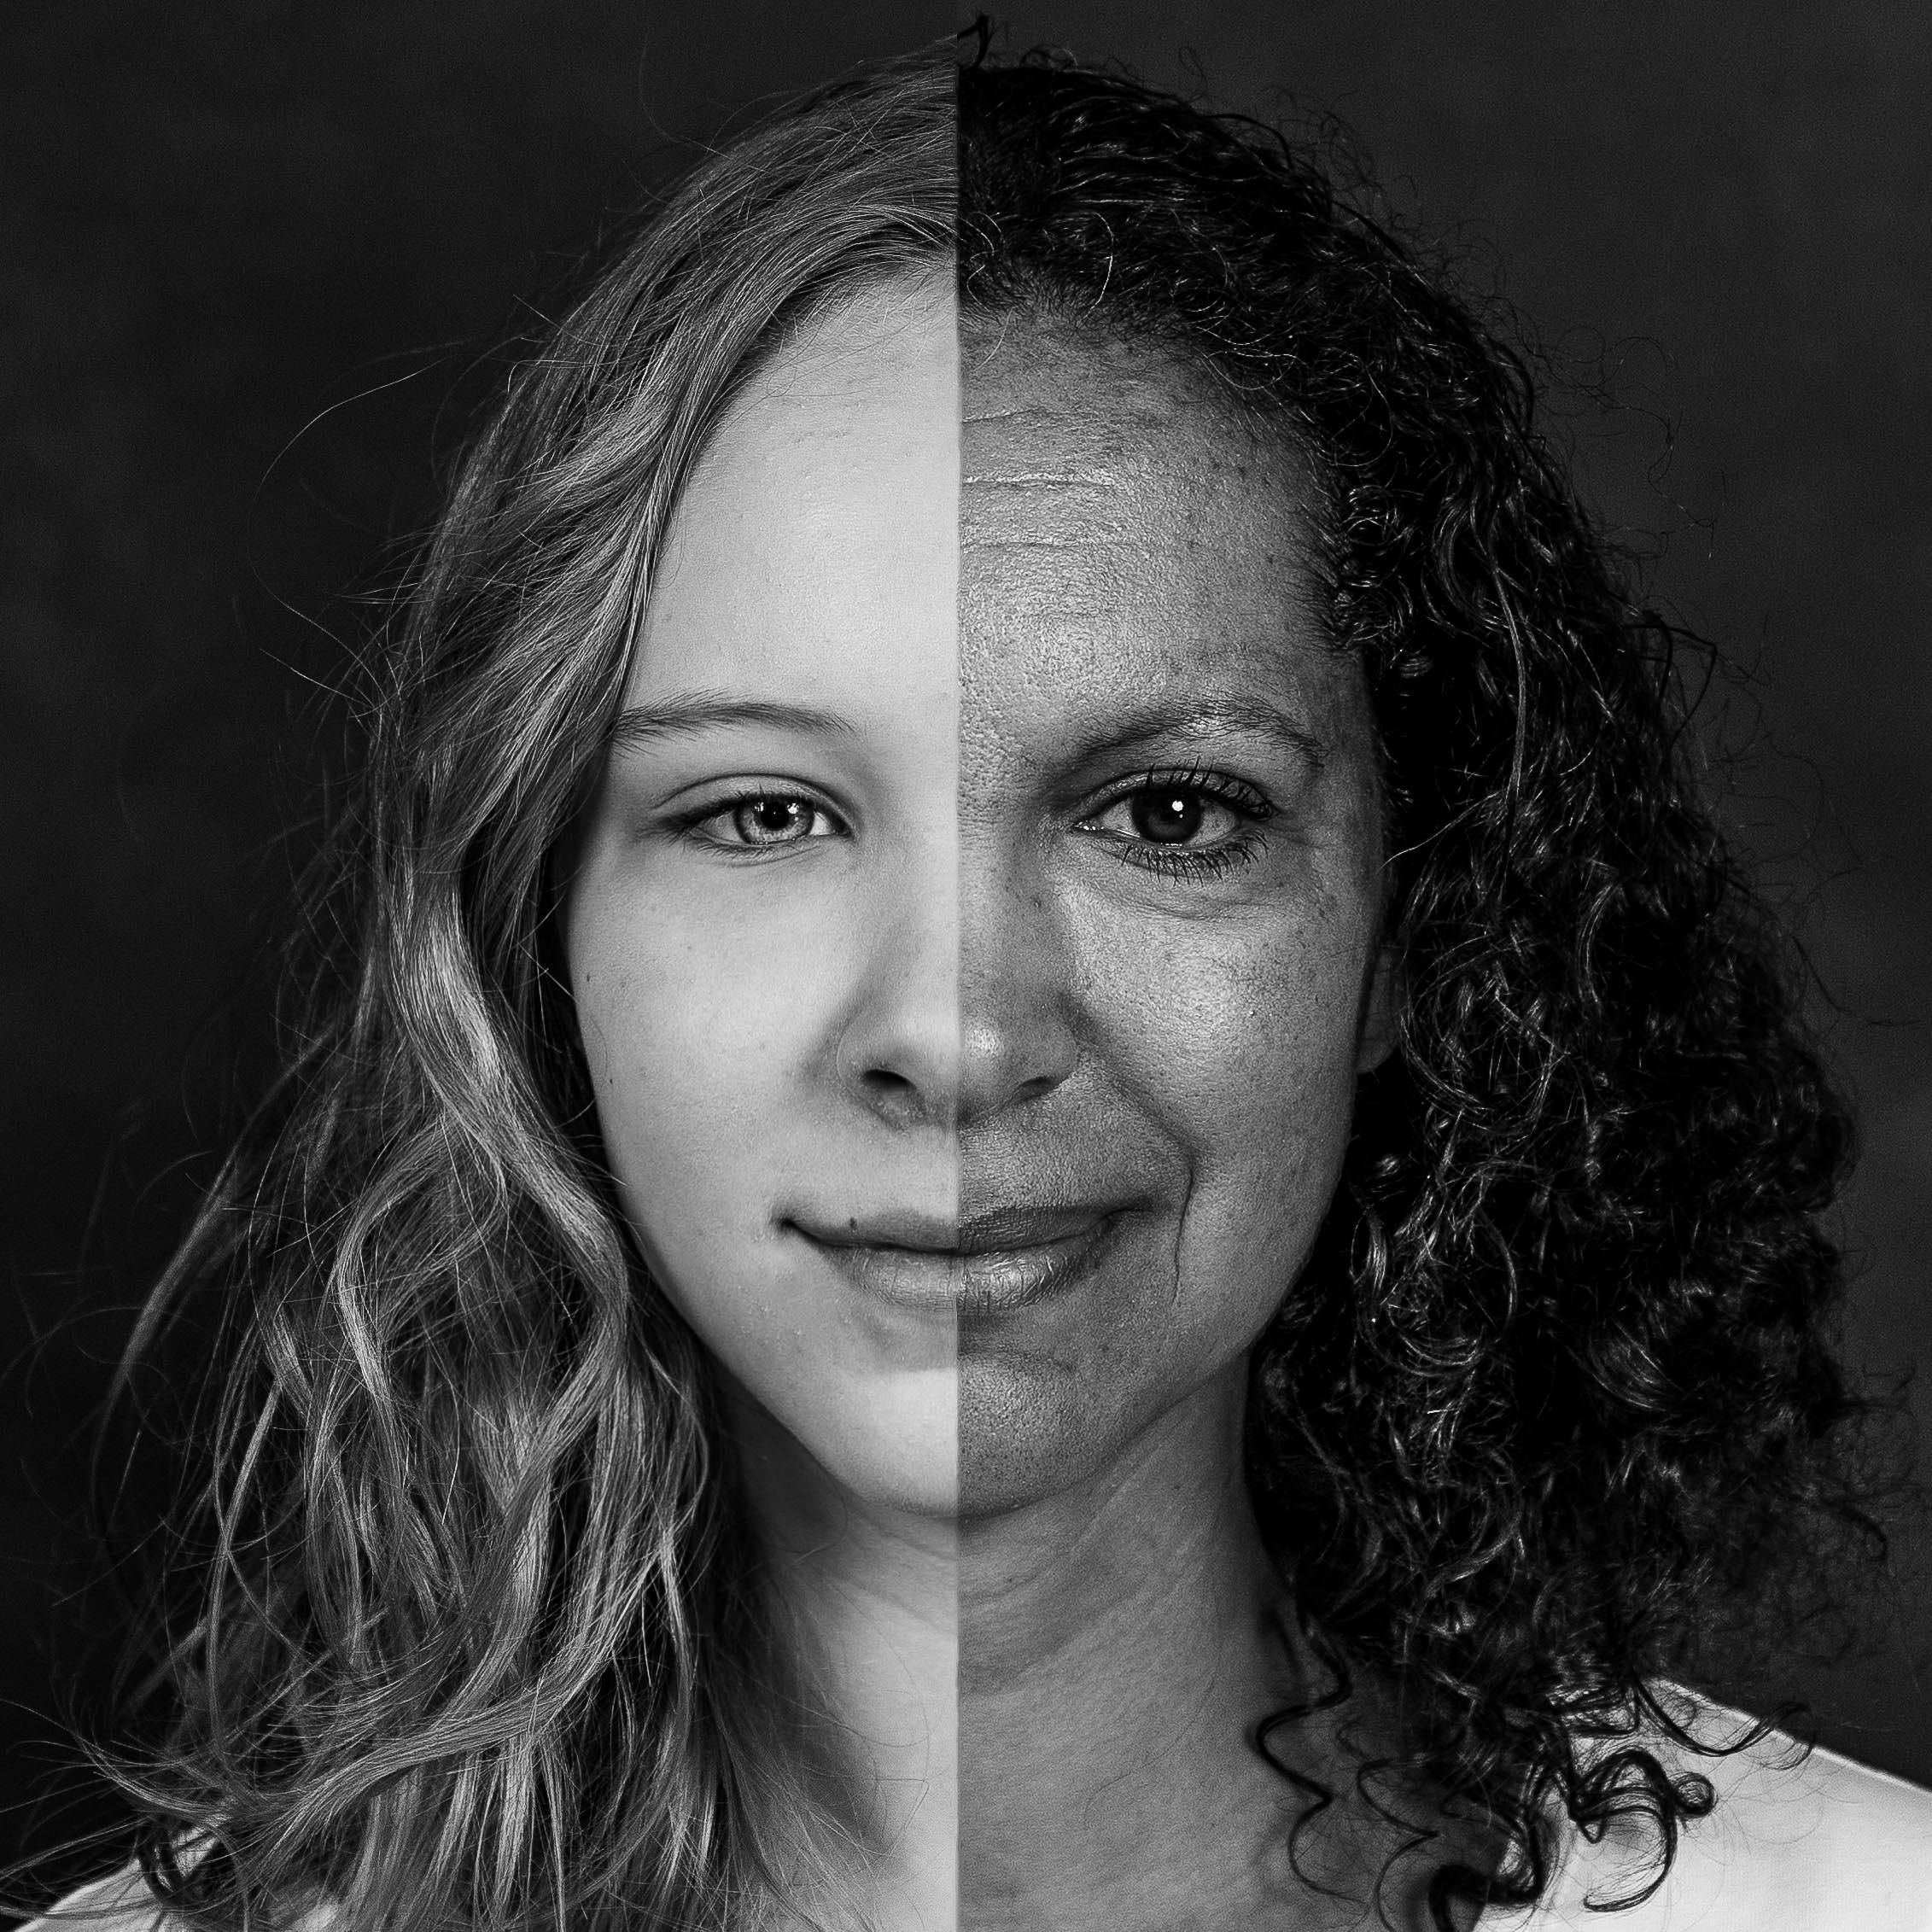 LvT Fotografie - project likeness of genes